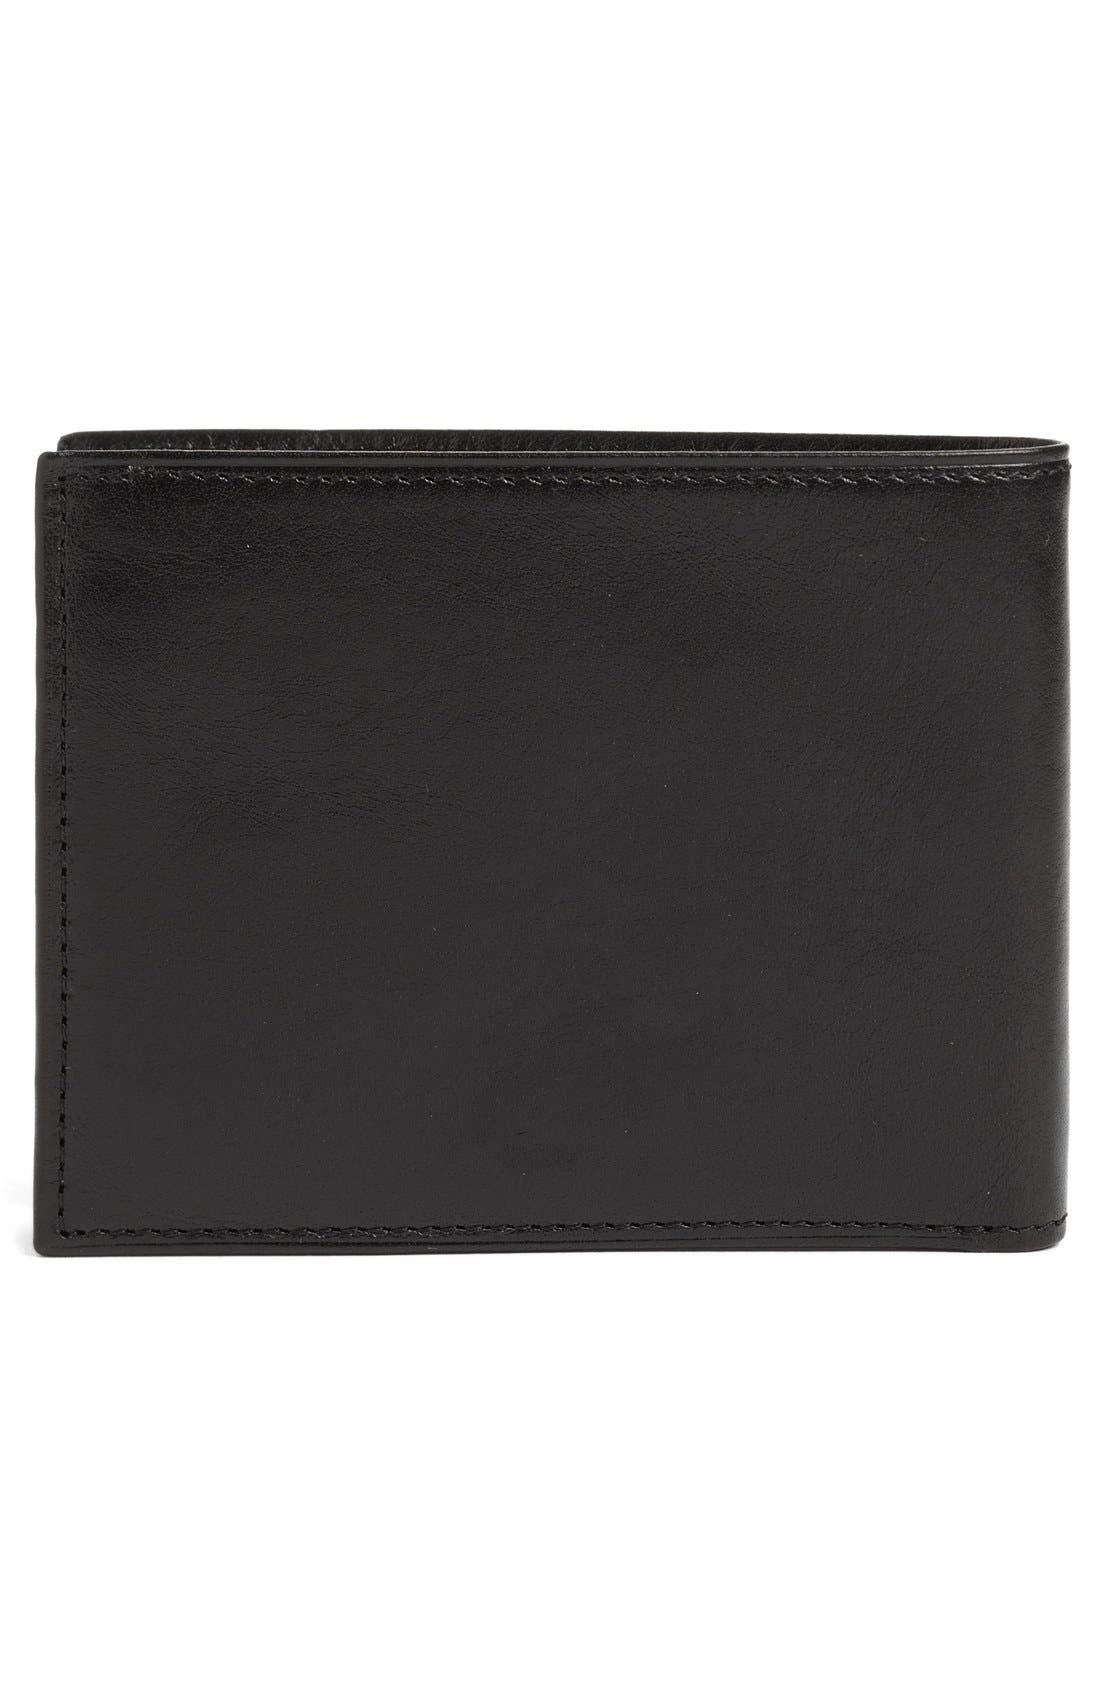 Leather Bifold Wallet,                             Alternate thumbnail 3, color,                             Black